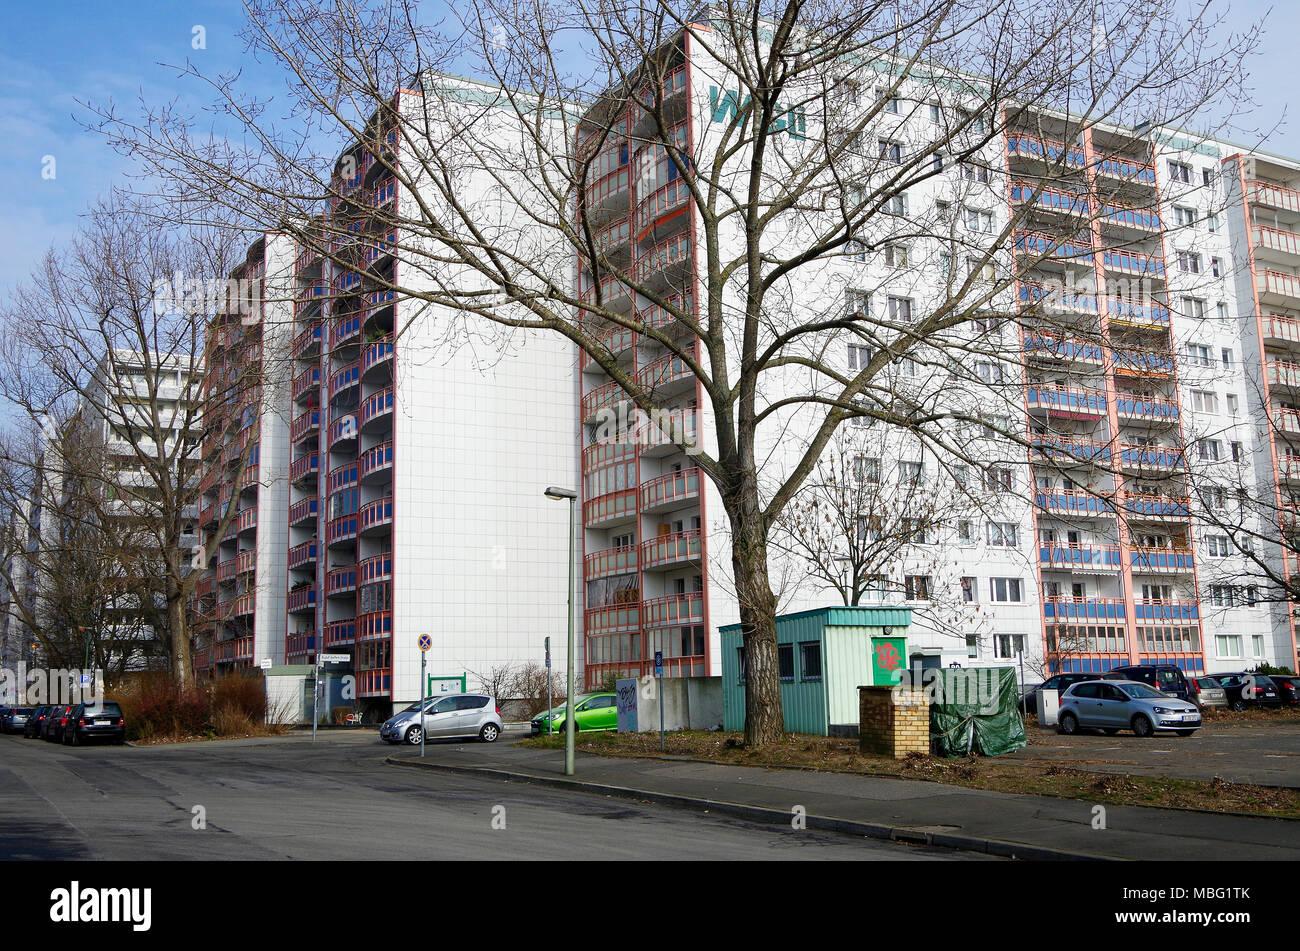 Housing Co Operative Stock Photos & Housing Co Operative